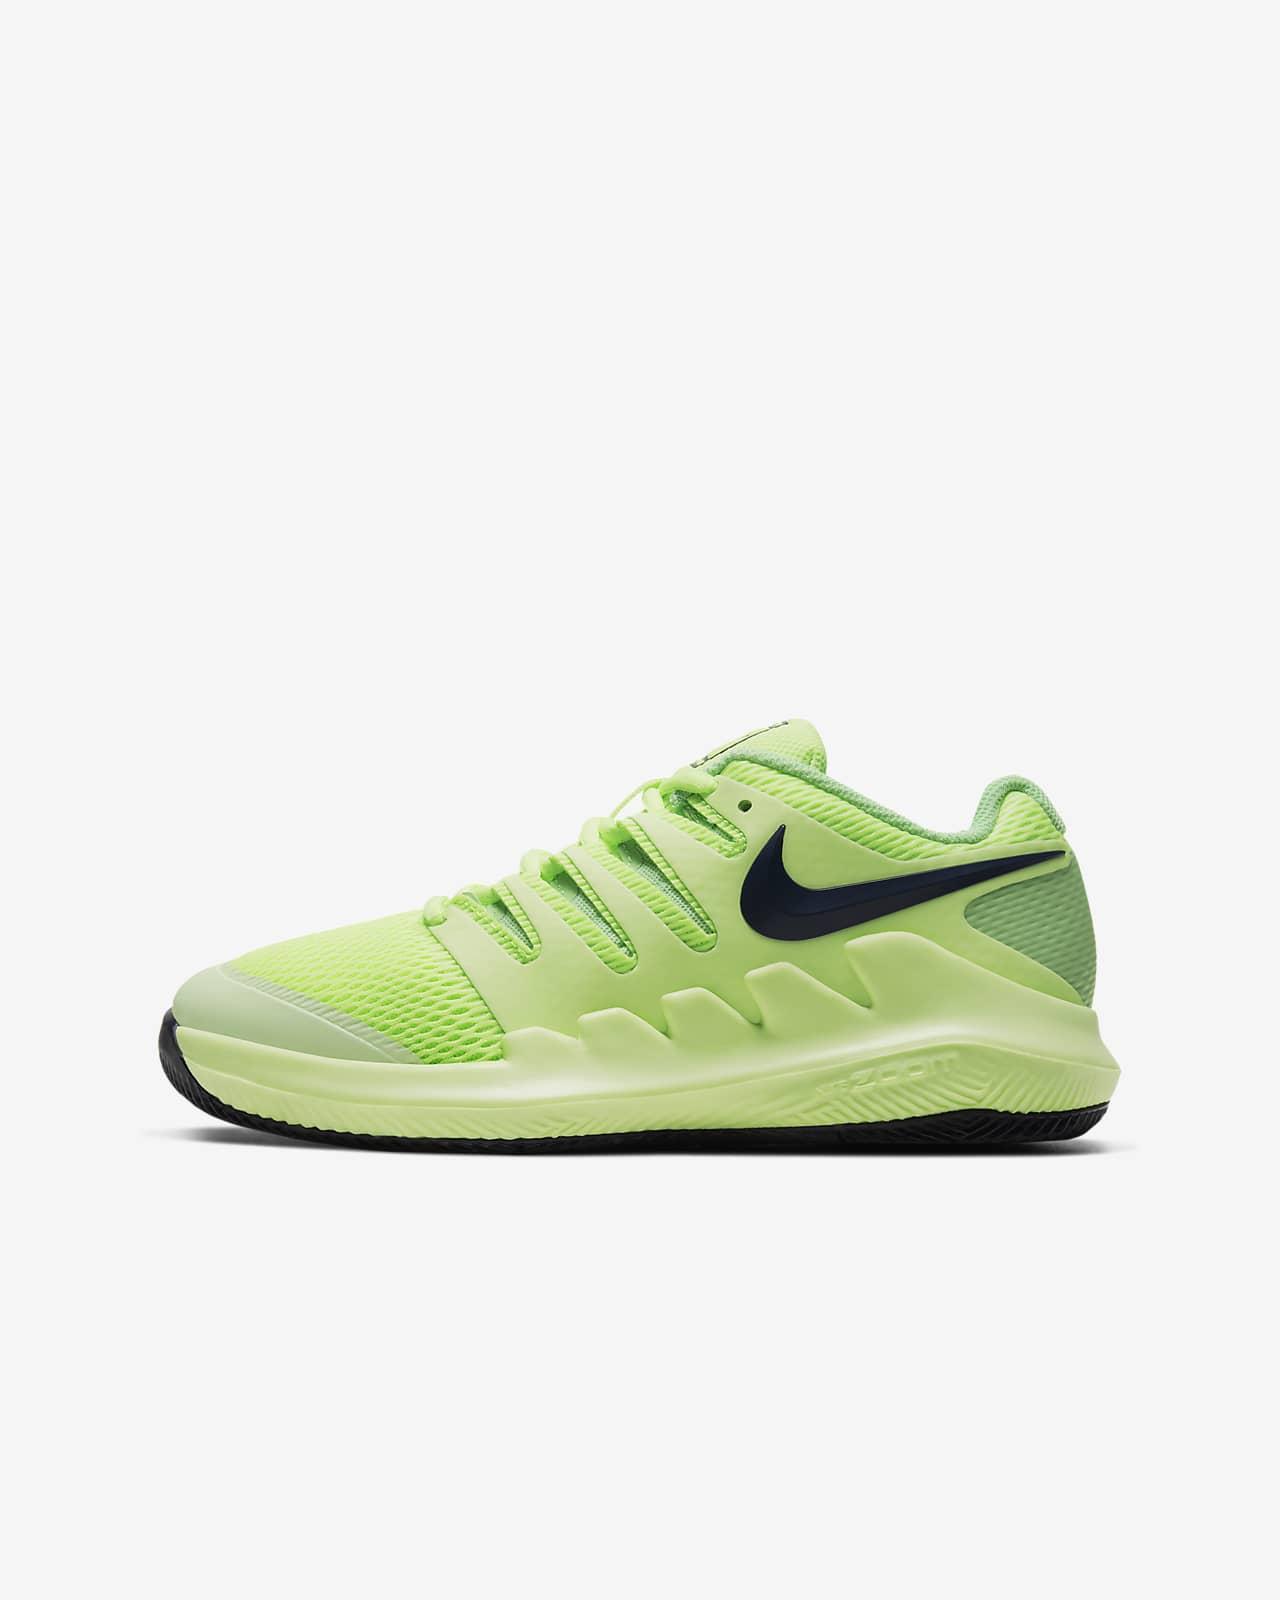 NikeCourt Jr. Vapor X Tennisschuh für jüngere/ältere Kinder